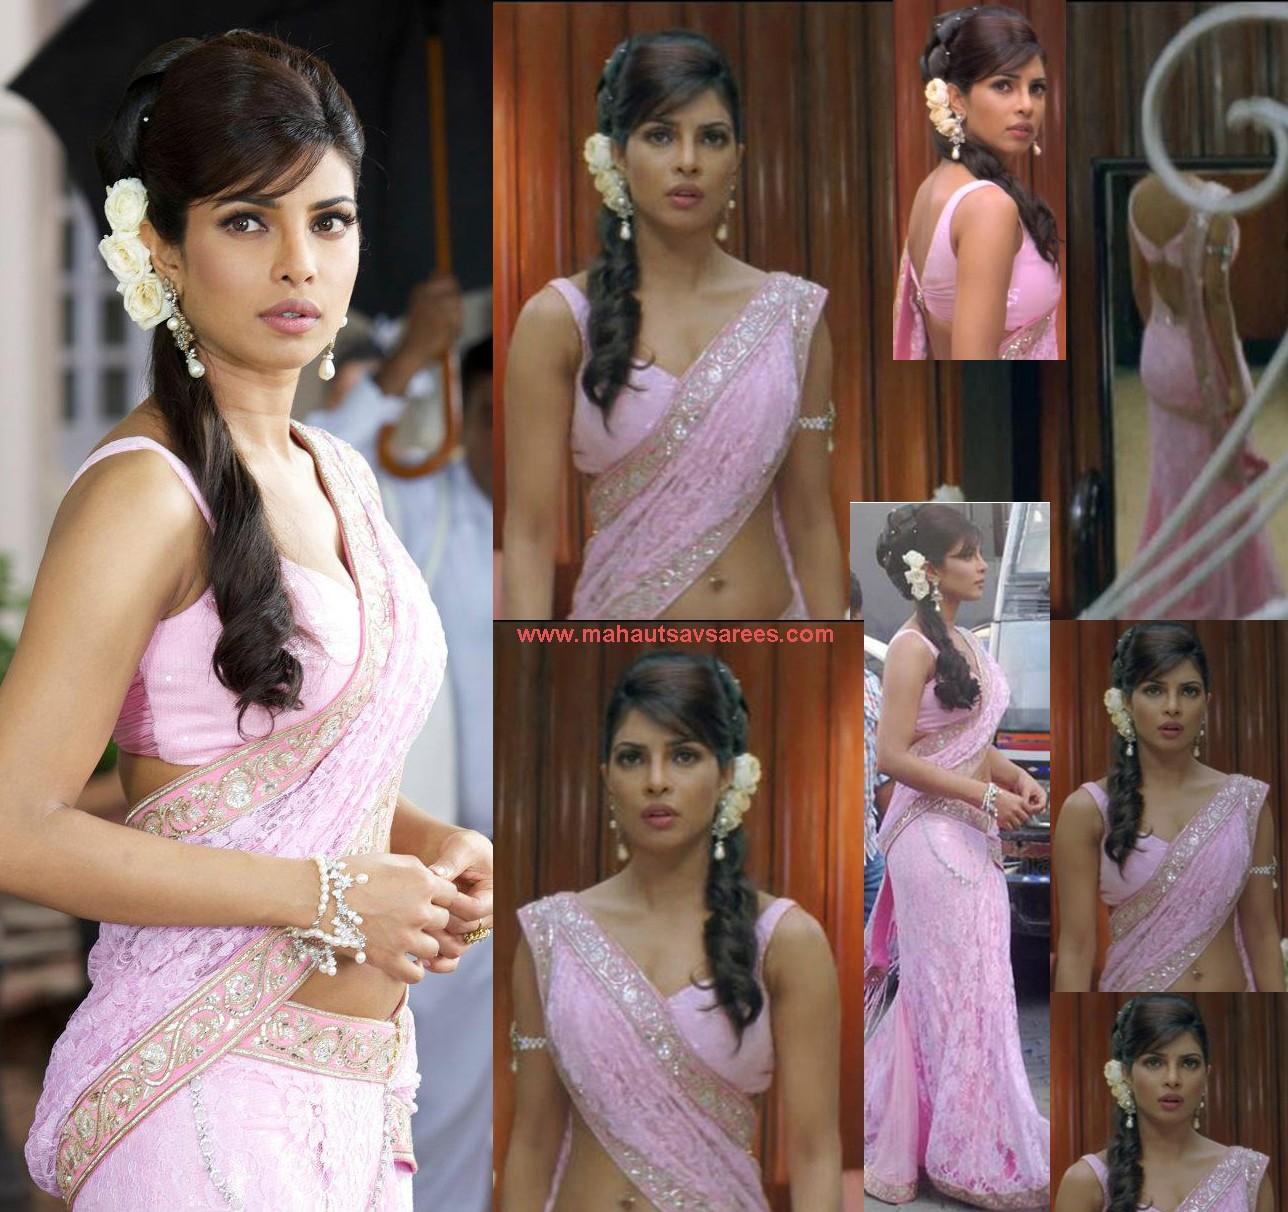 Priyanka Chopra In Pink Saree Priyanka Chopra In Saree In Teri Meri Kahani Movie